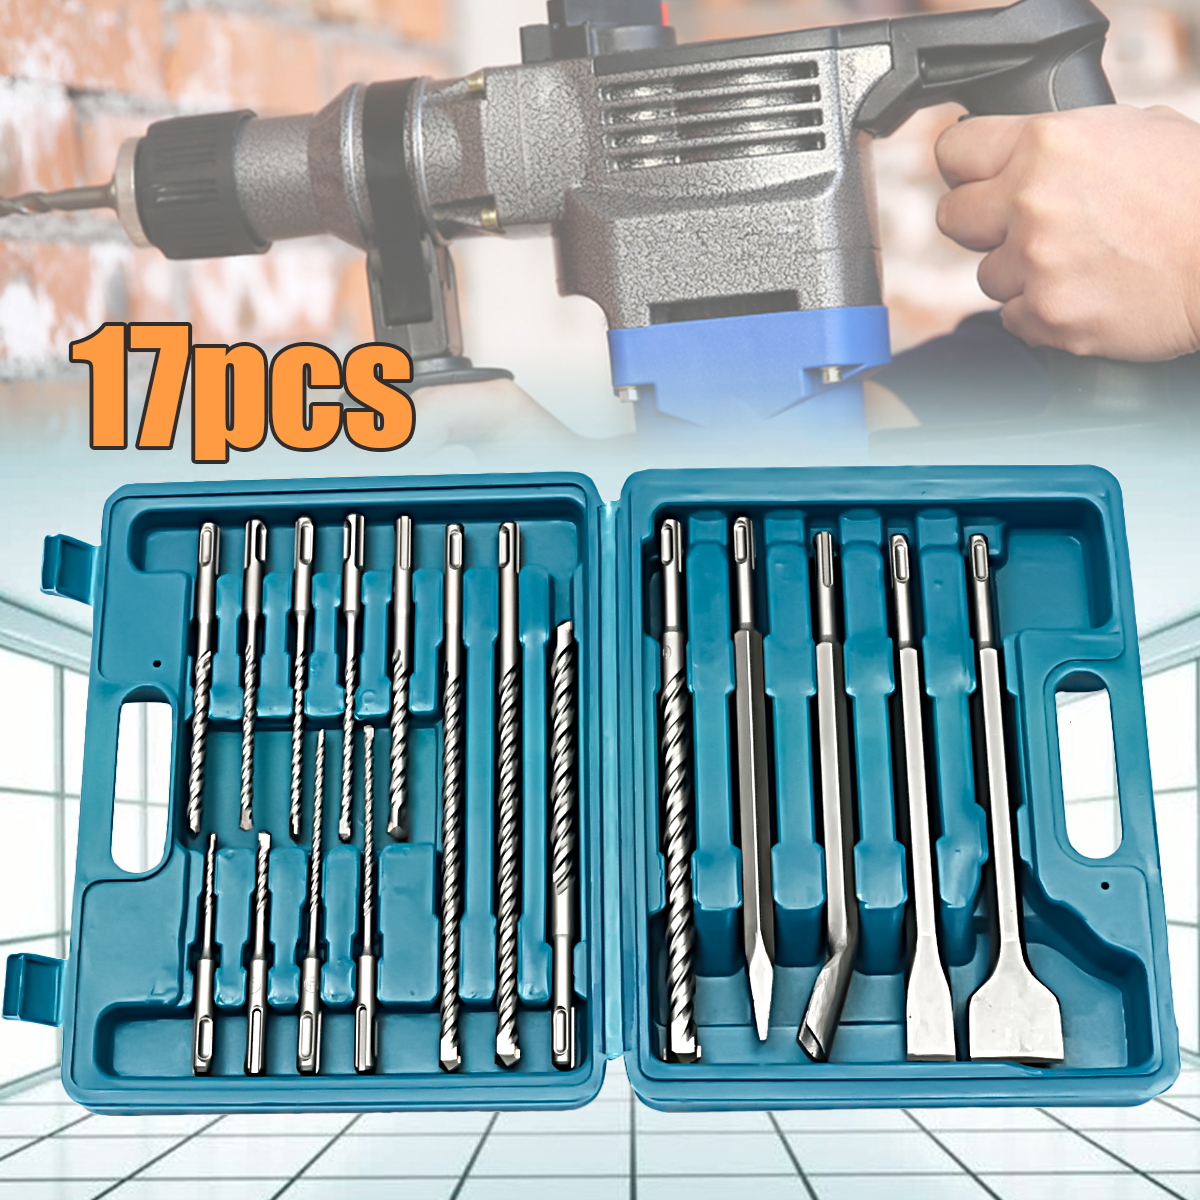 17pcs/set Drill Bits Chisel SDS Plus Rotary Hammer Bits Set Fit Bosch HILTI Plus Hydropower Installation Tools